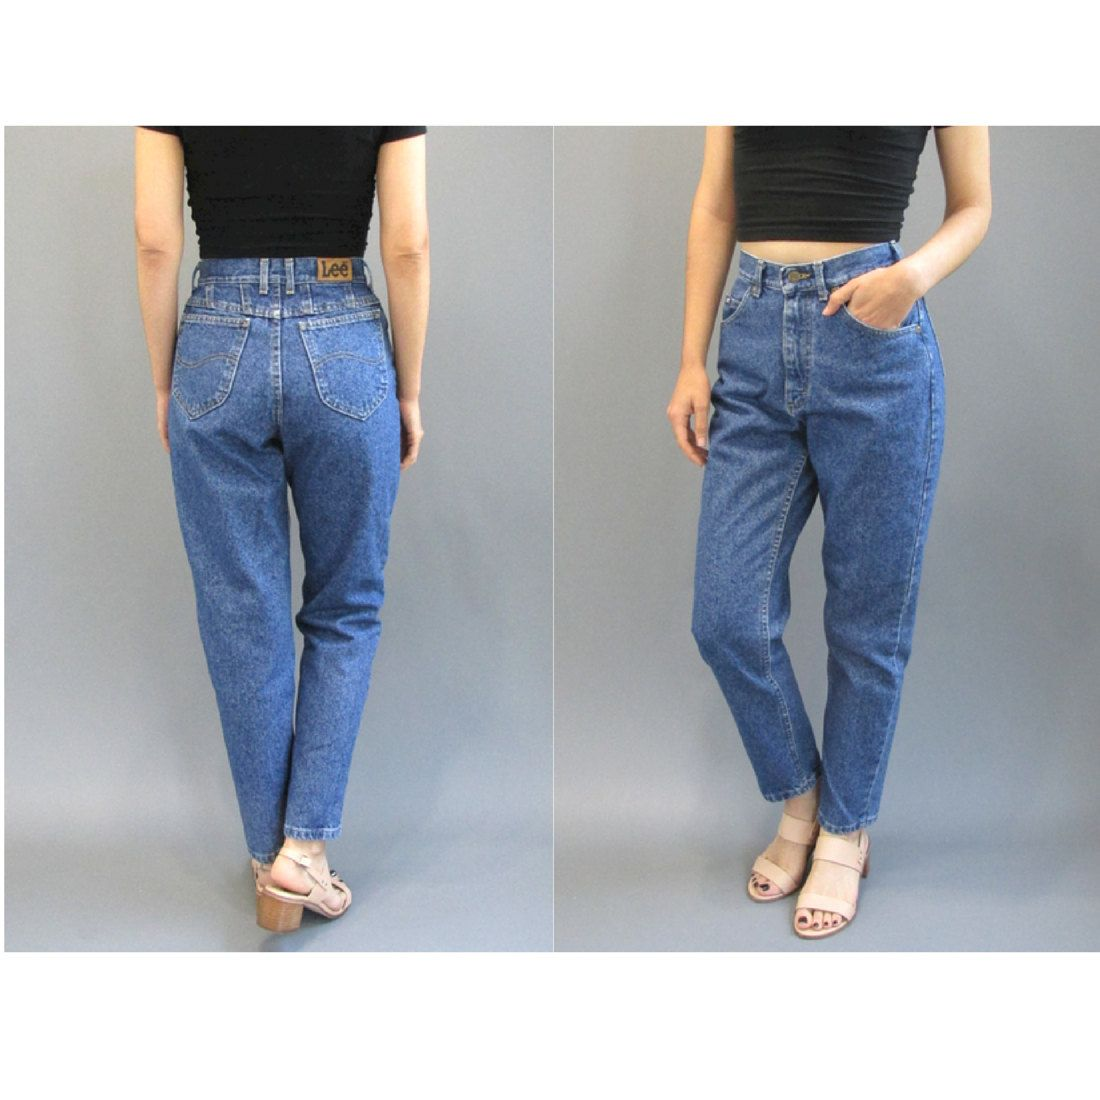 size 28 90s jordache high waist mom jeans size 28. Black Bedroom Furniture Sets. Home Design Ideas